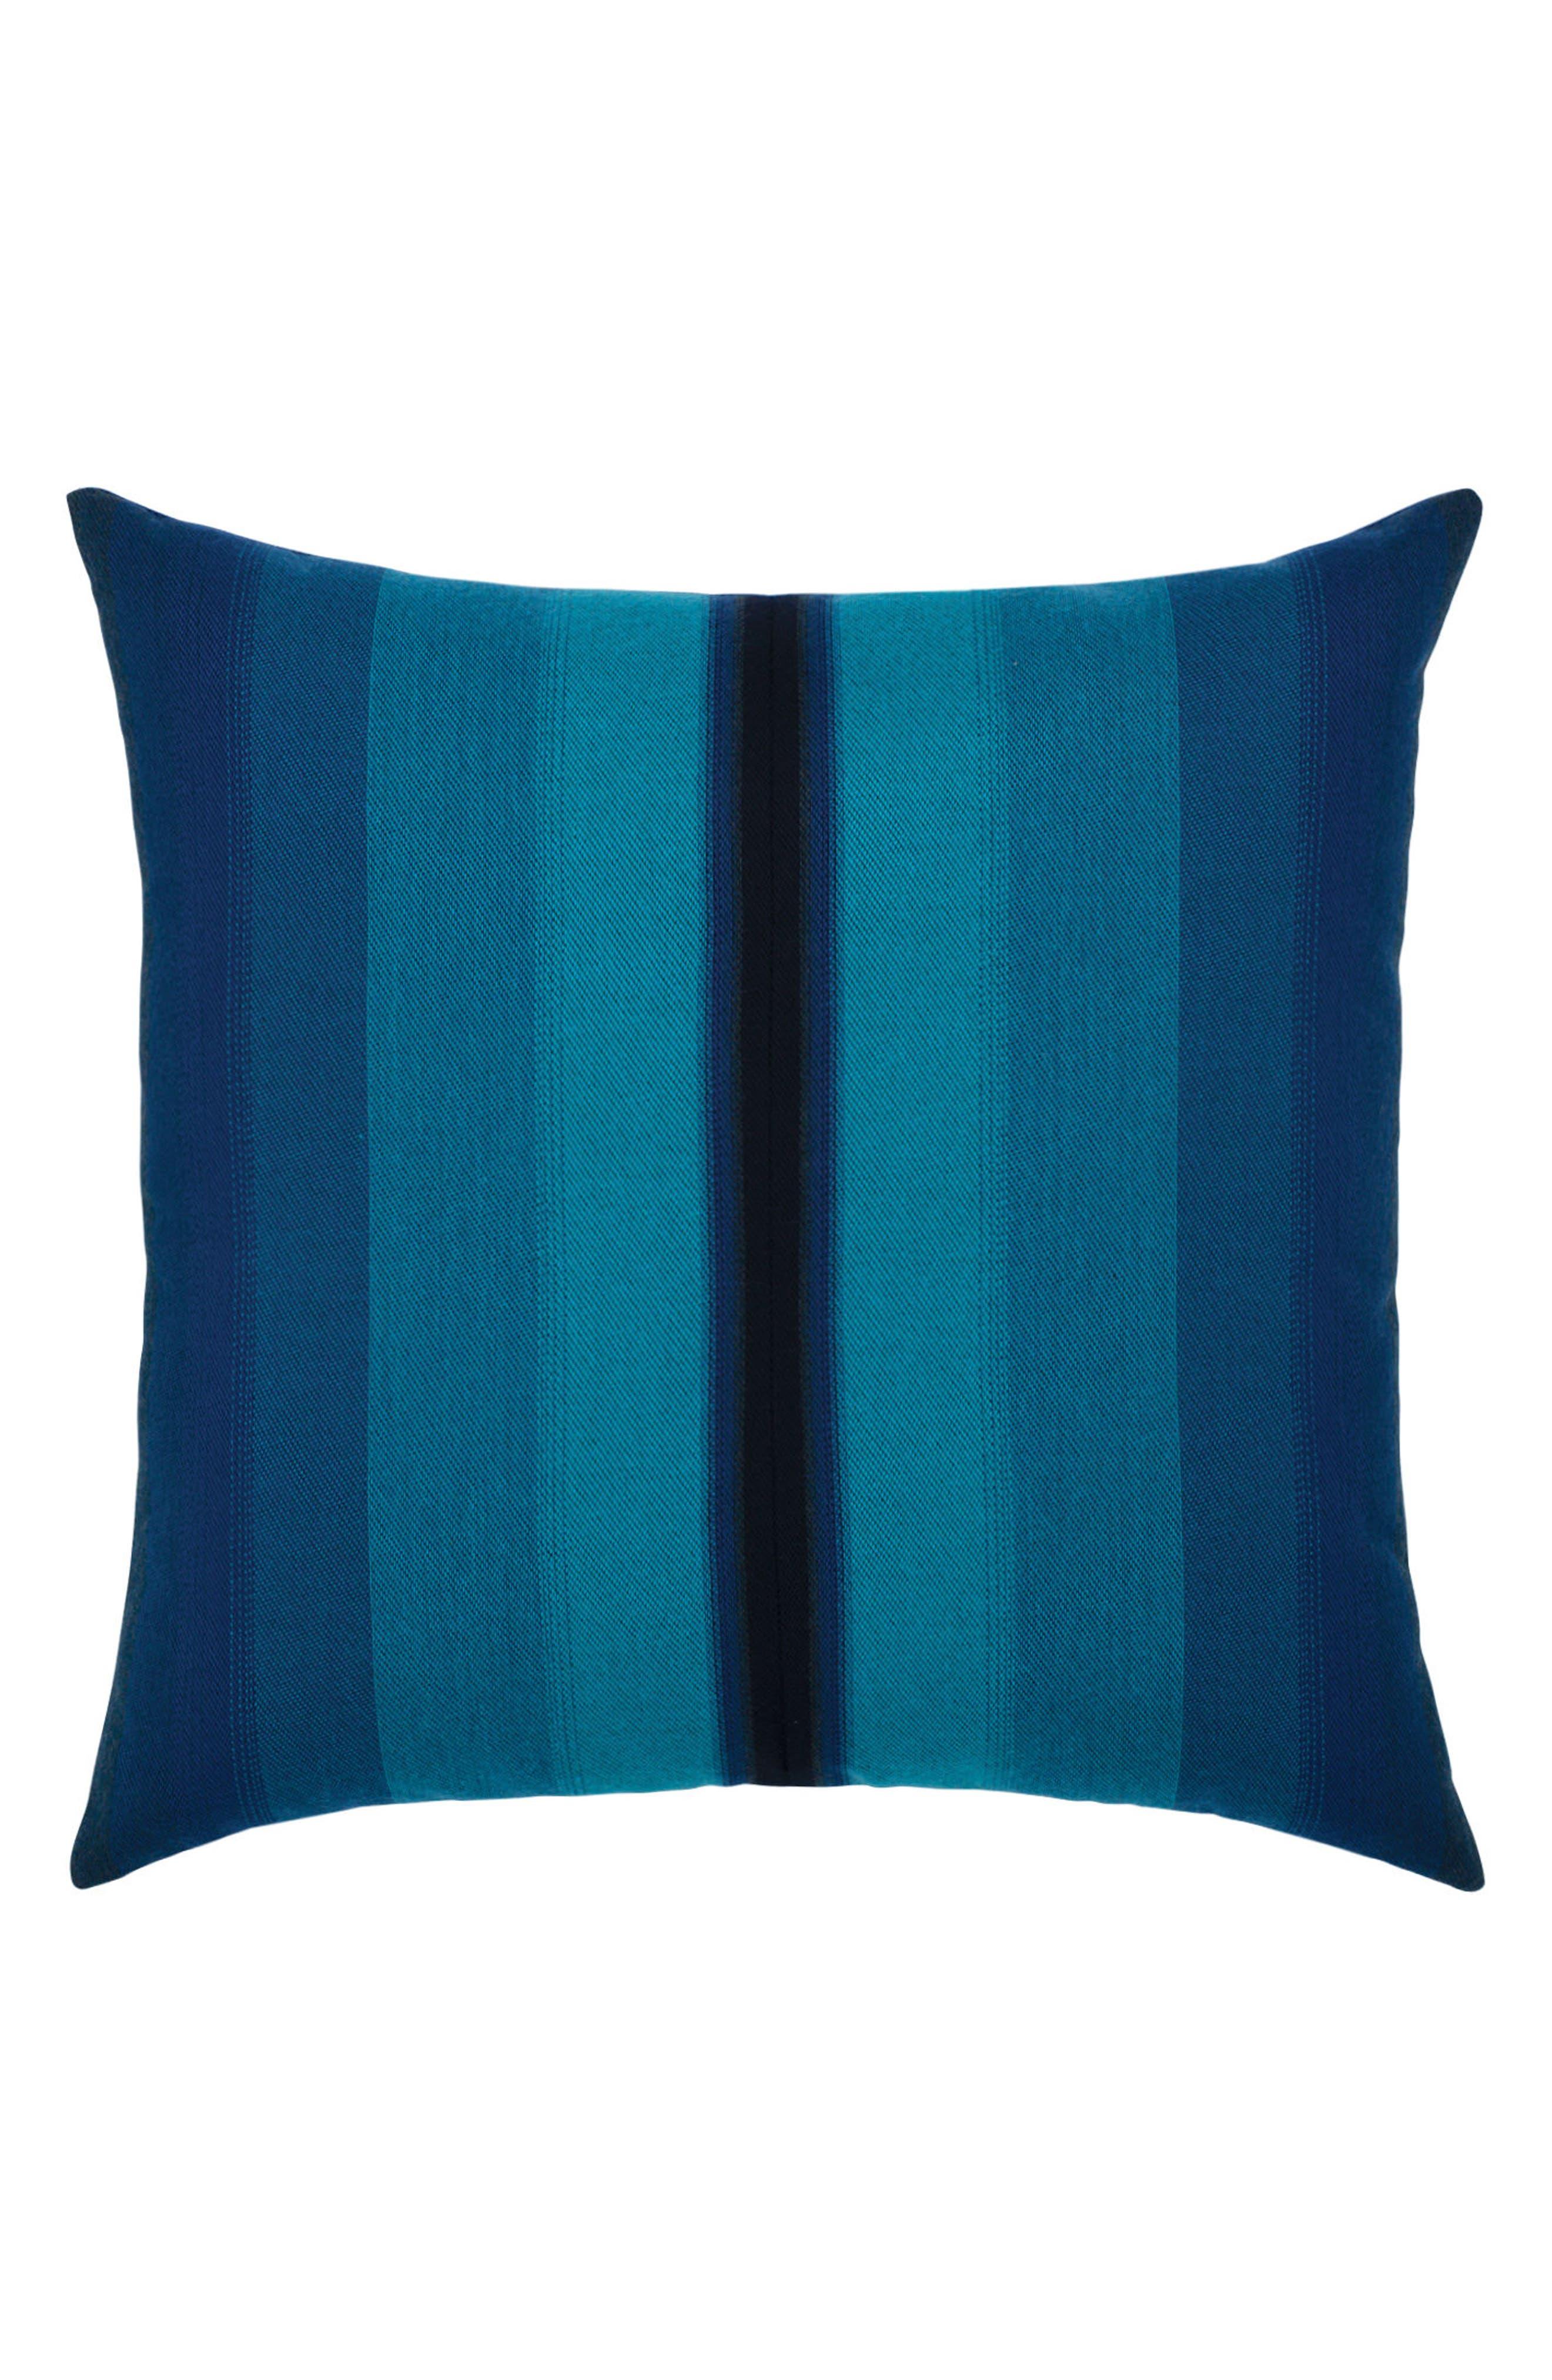 Ombré Azure Indoor/Outdoor Accent Pillow,                         Main,                         color, Blue